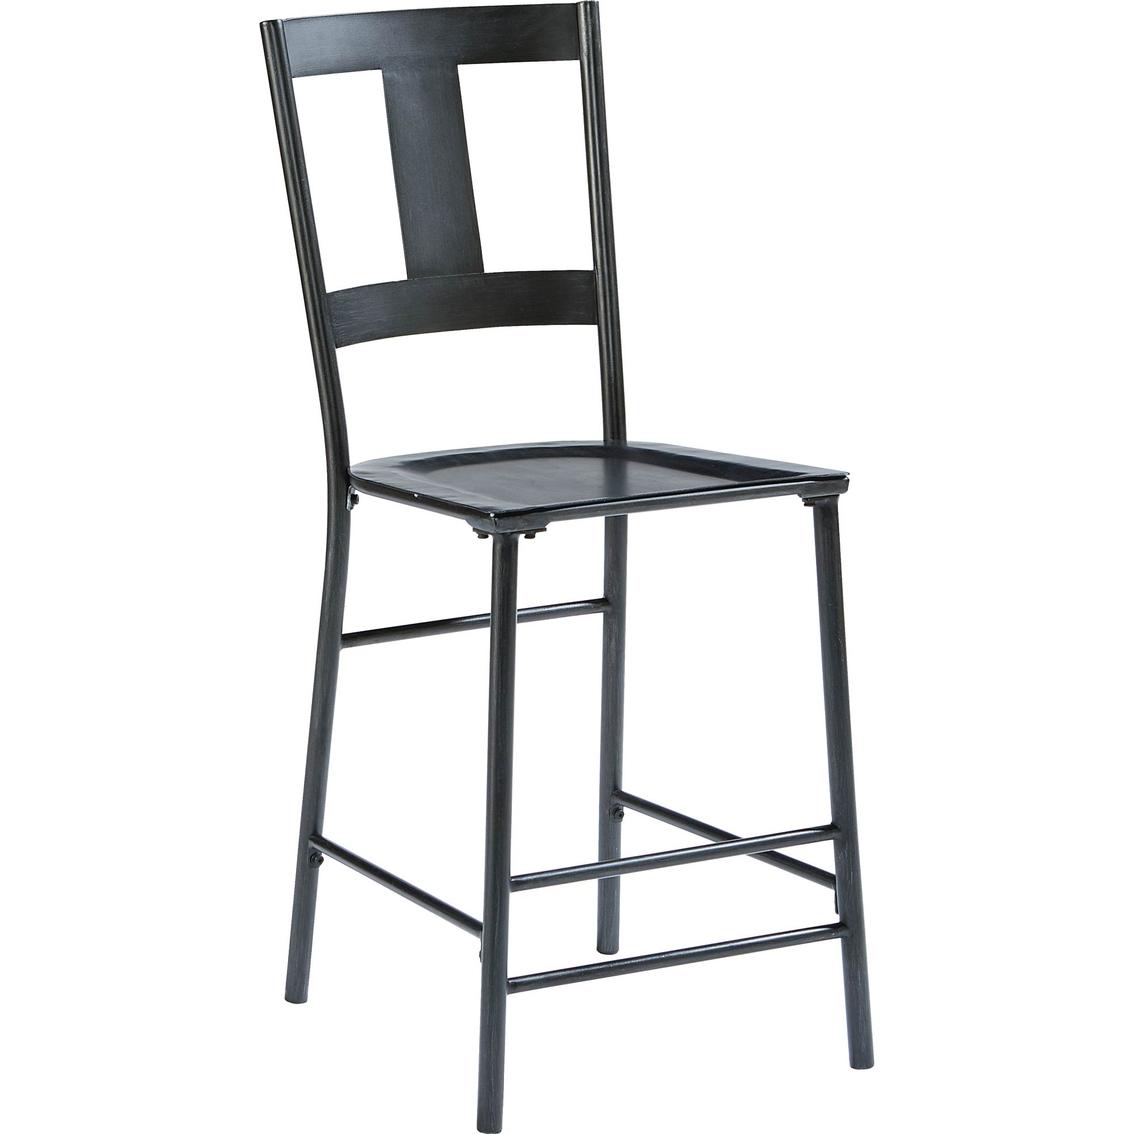 Magnolia home t back metal bar stool 2 pk bar furniture for Magnolia home furniture bar stools